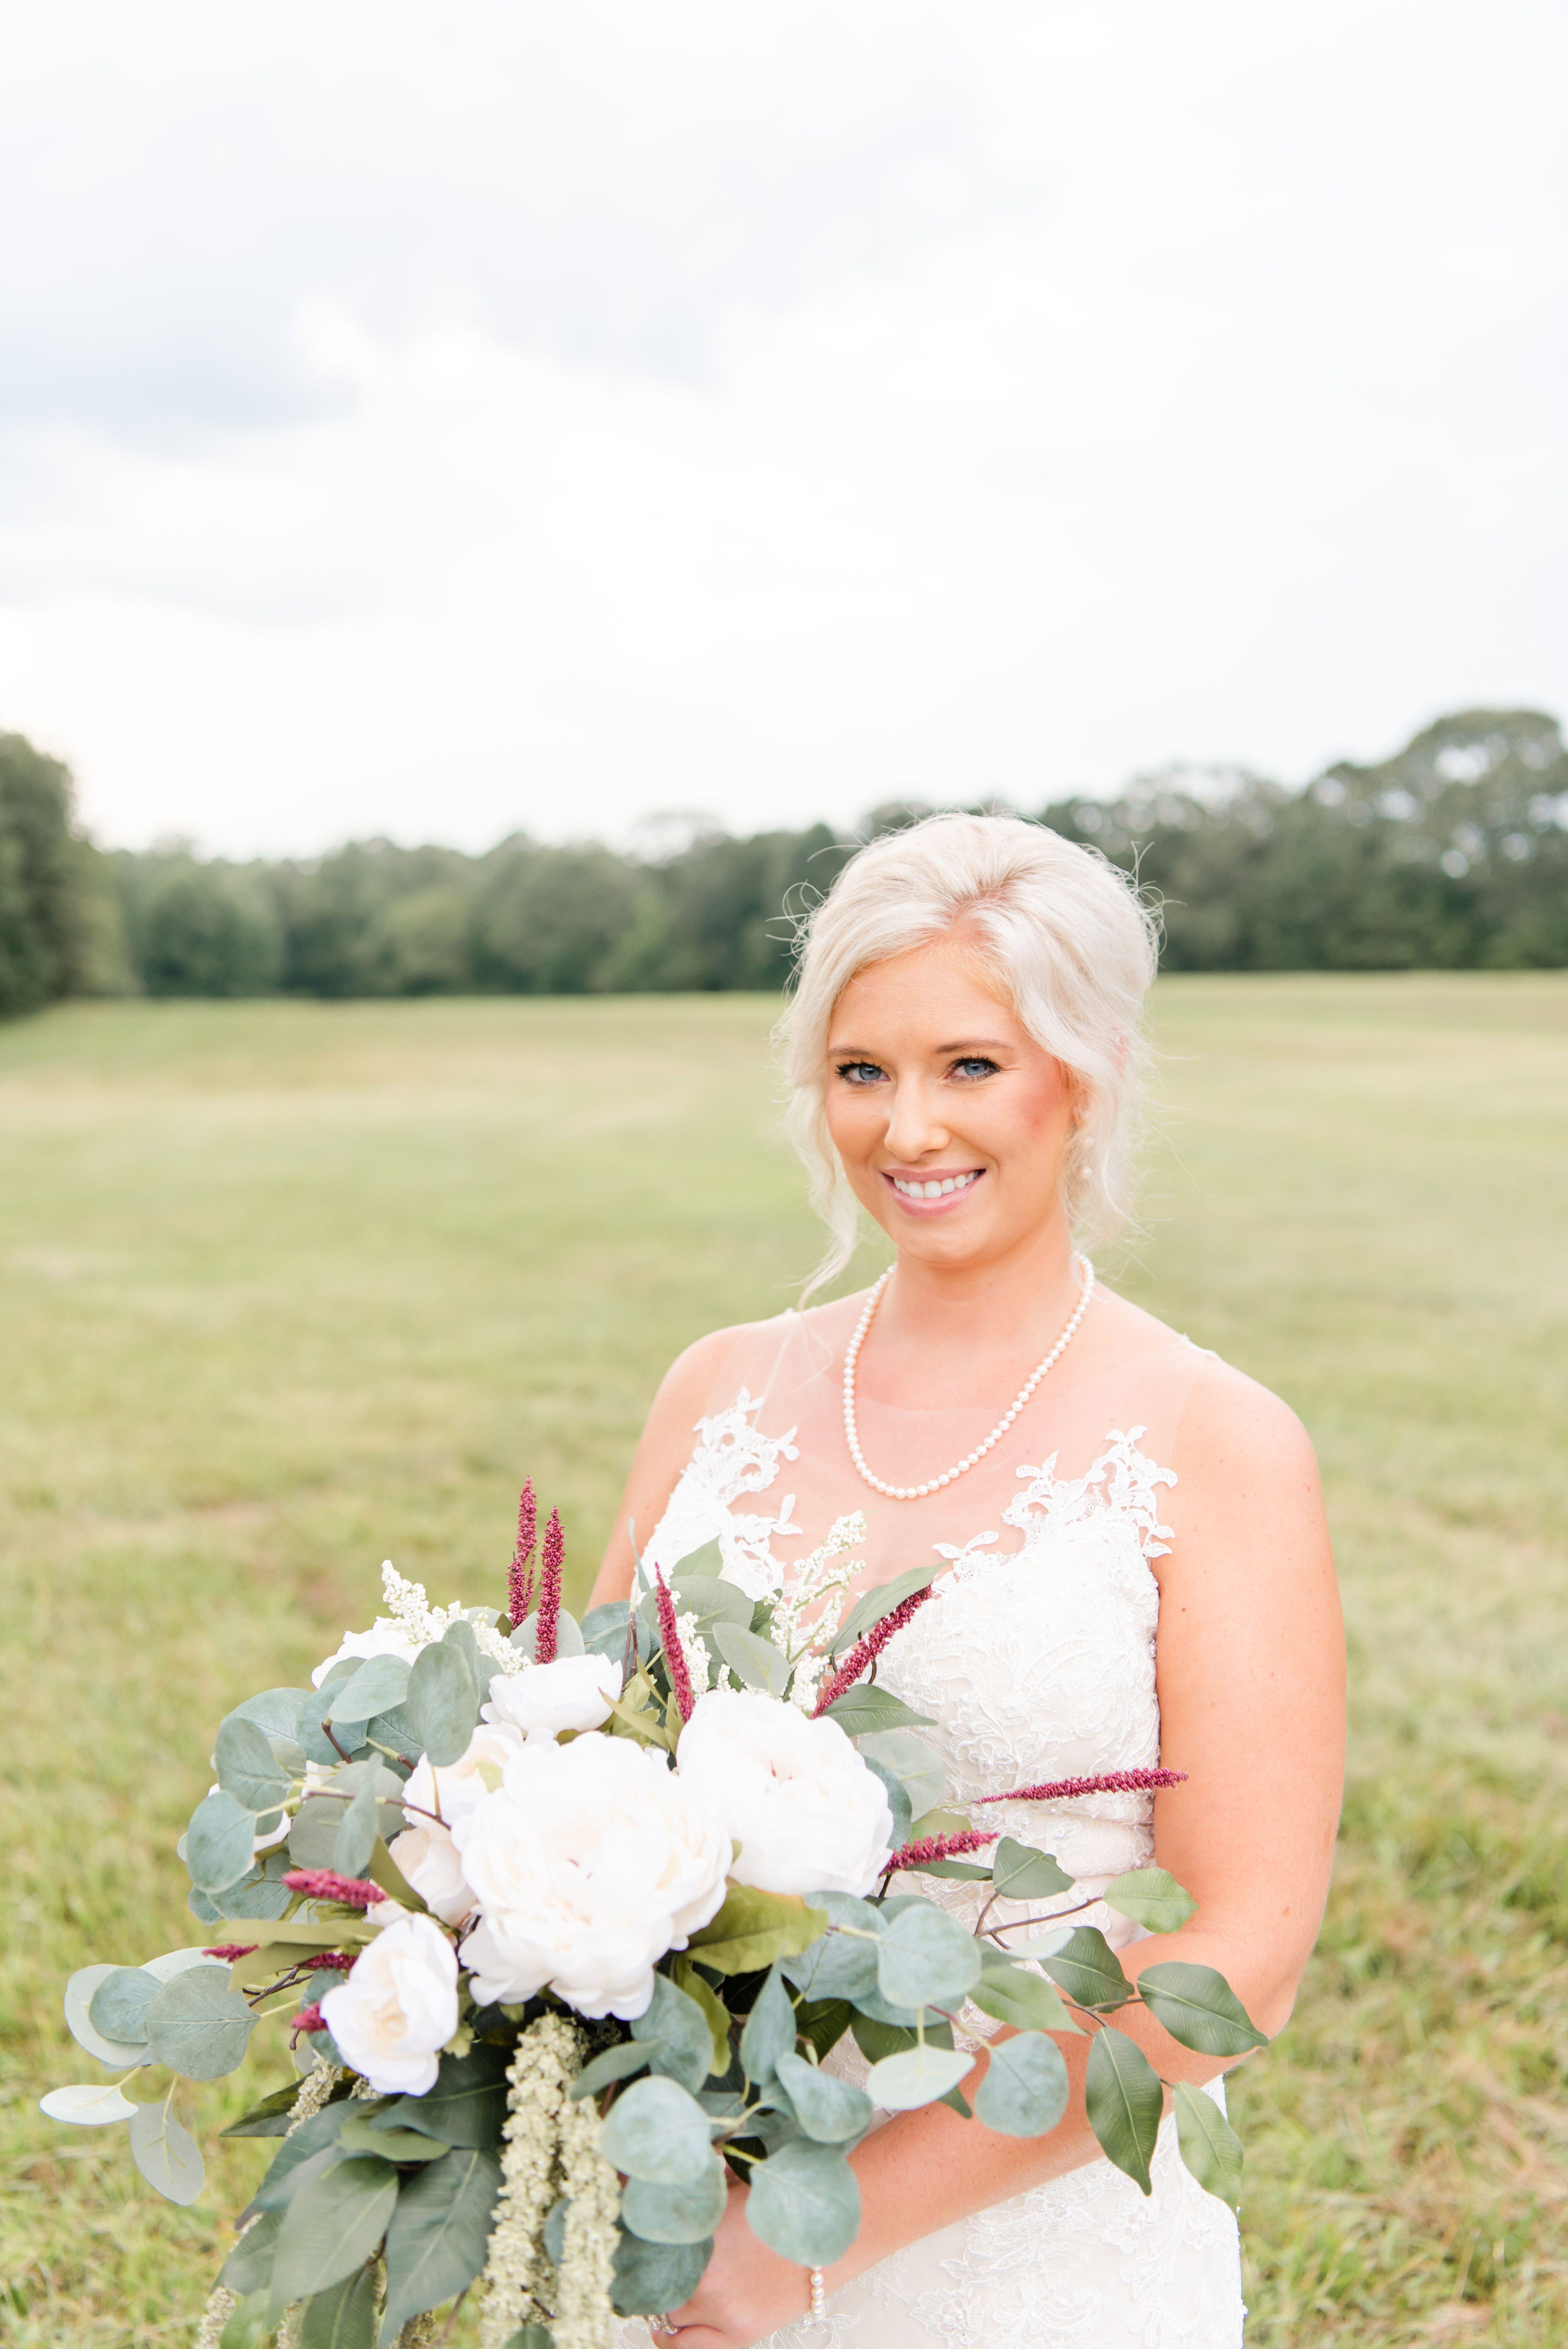 North Carolina Bridal Portraits Hickory Nc Tasha Barbour Photography Nc Wedding Photographer Bridal Portraits Wedding Photographers Nc Wedding